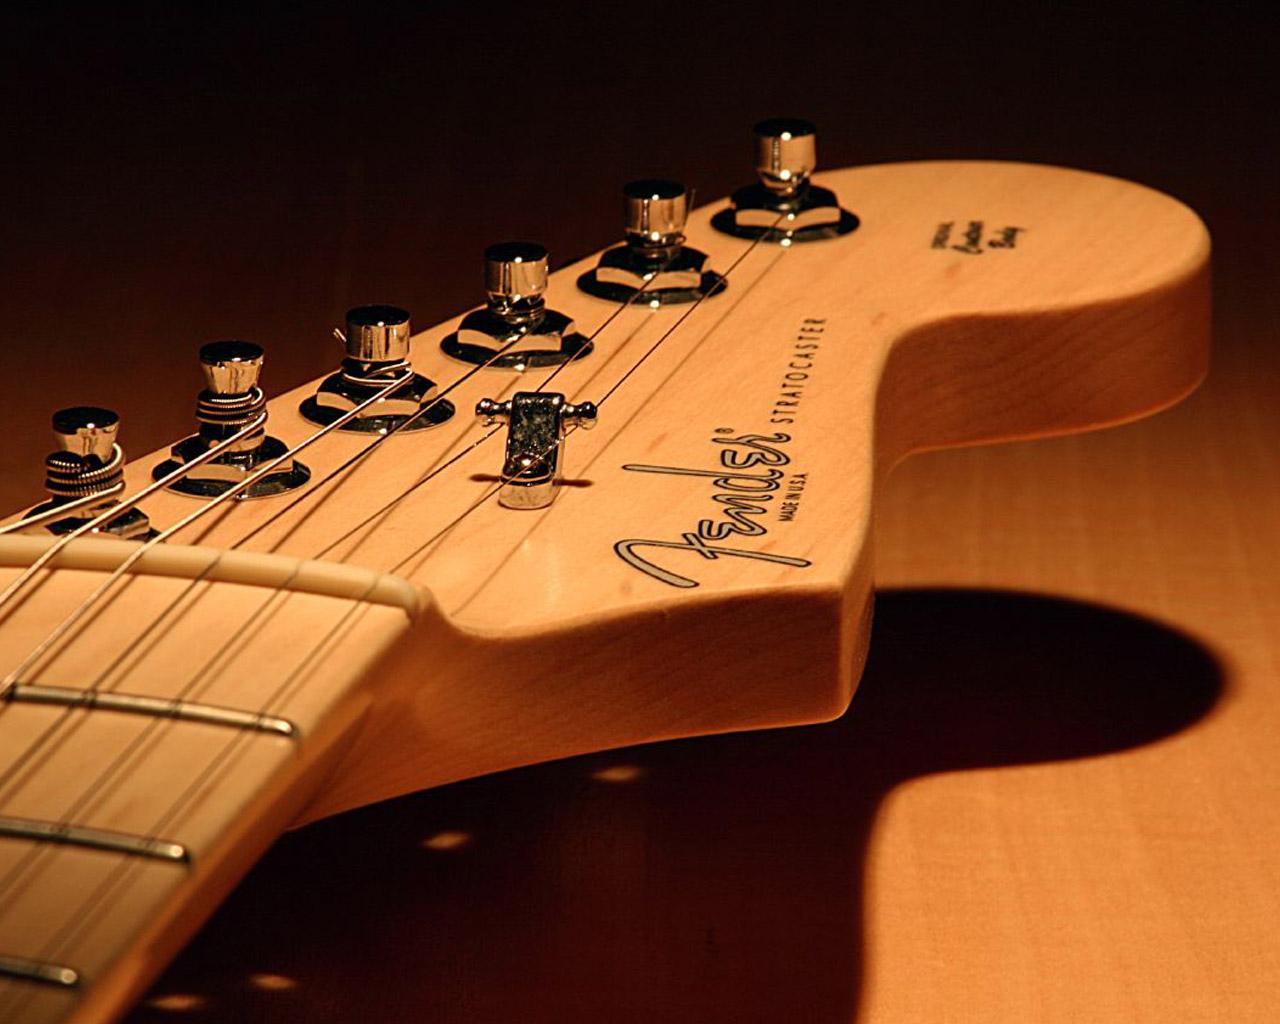 http://1.bp.blogspot.com/_eYNXA0gKwI0/TQFLY3NOqCI/AAAAAAAAADg/ku2fGS29xuU/s1600/Fender+Stratocasters+Music+Desktop+1280x1024+greatguitarsound.blogspot.com.jpg